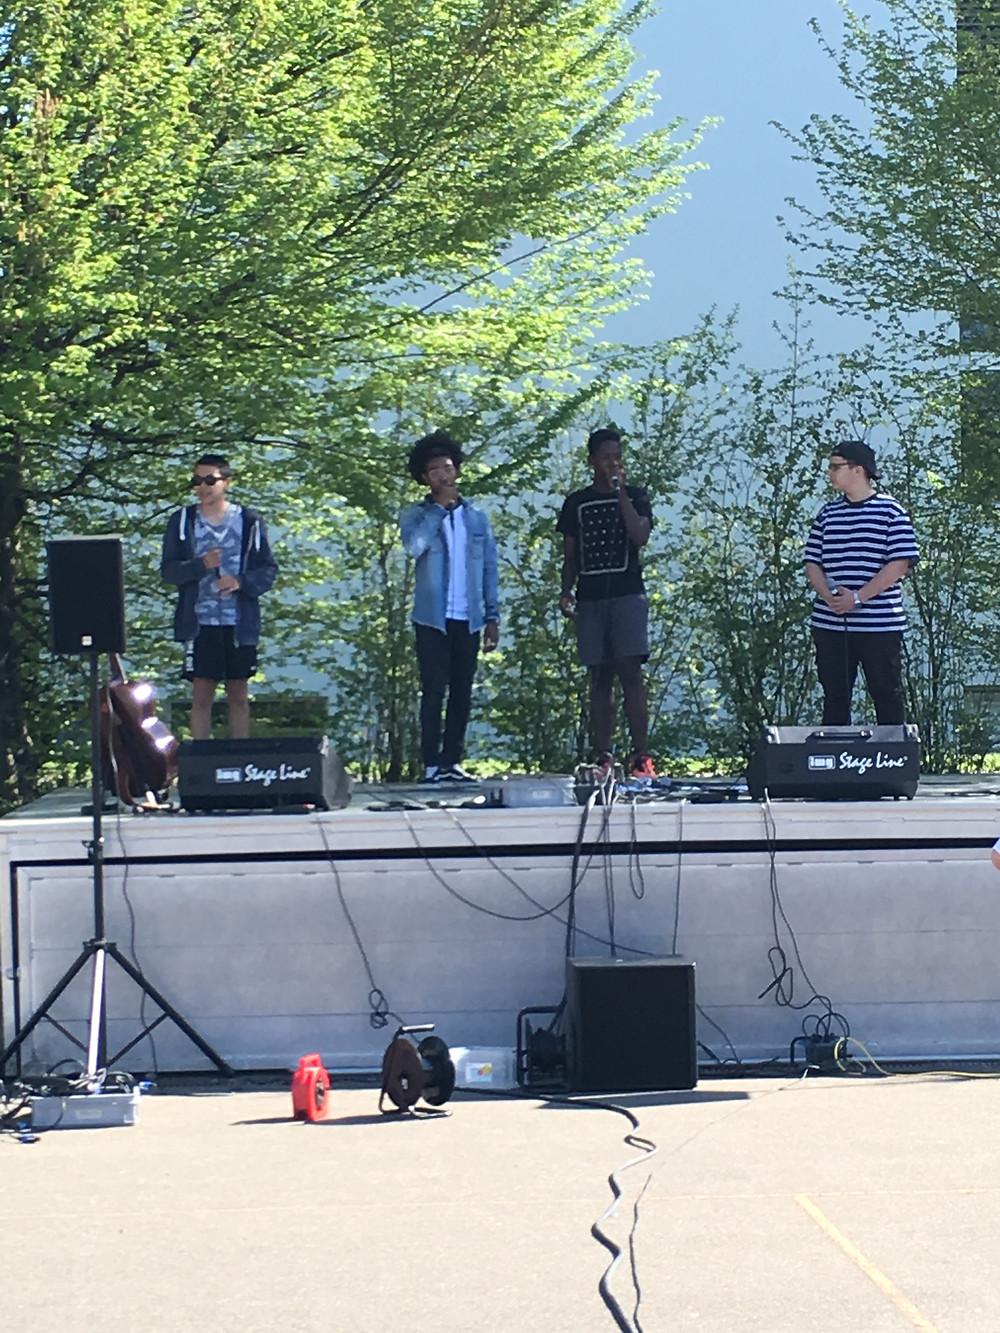 Spring Concert vom Do, 19.4.2018